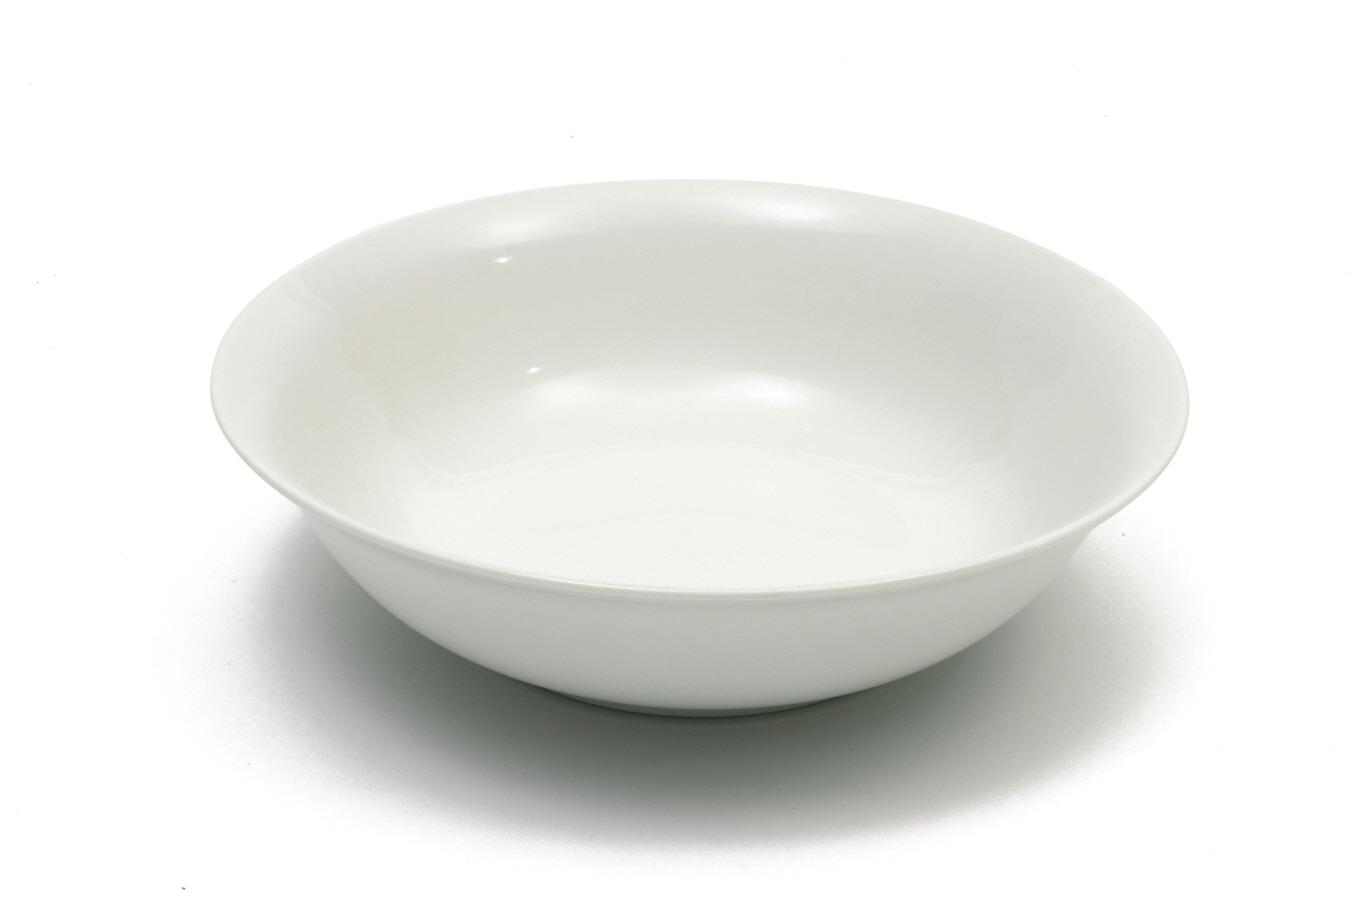 Porcelánová Miska na polévku 20 cm White Basics - Maxwell&Williams